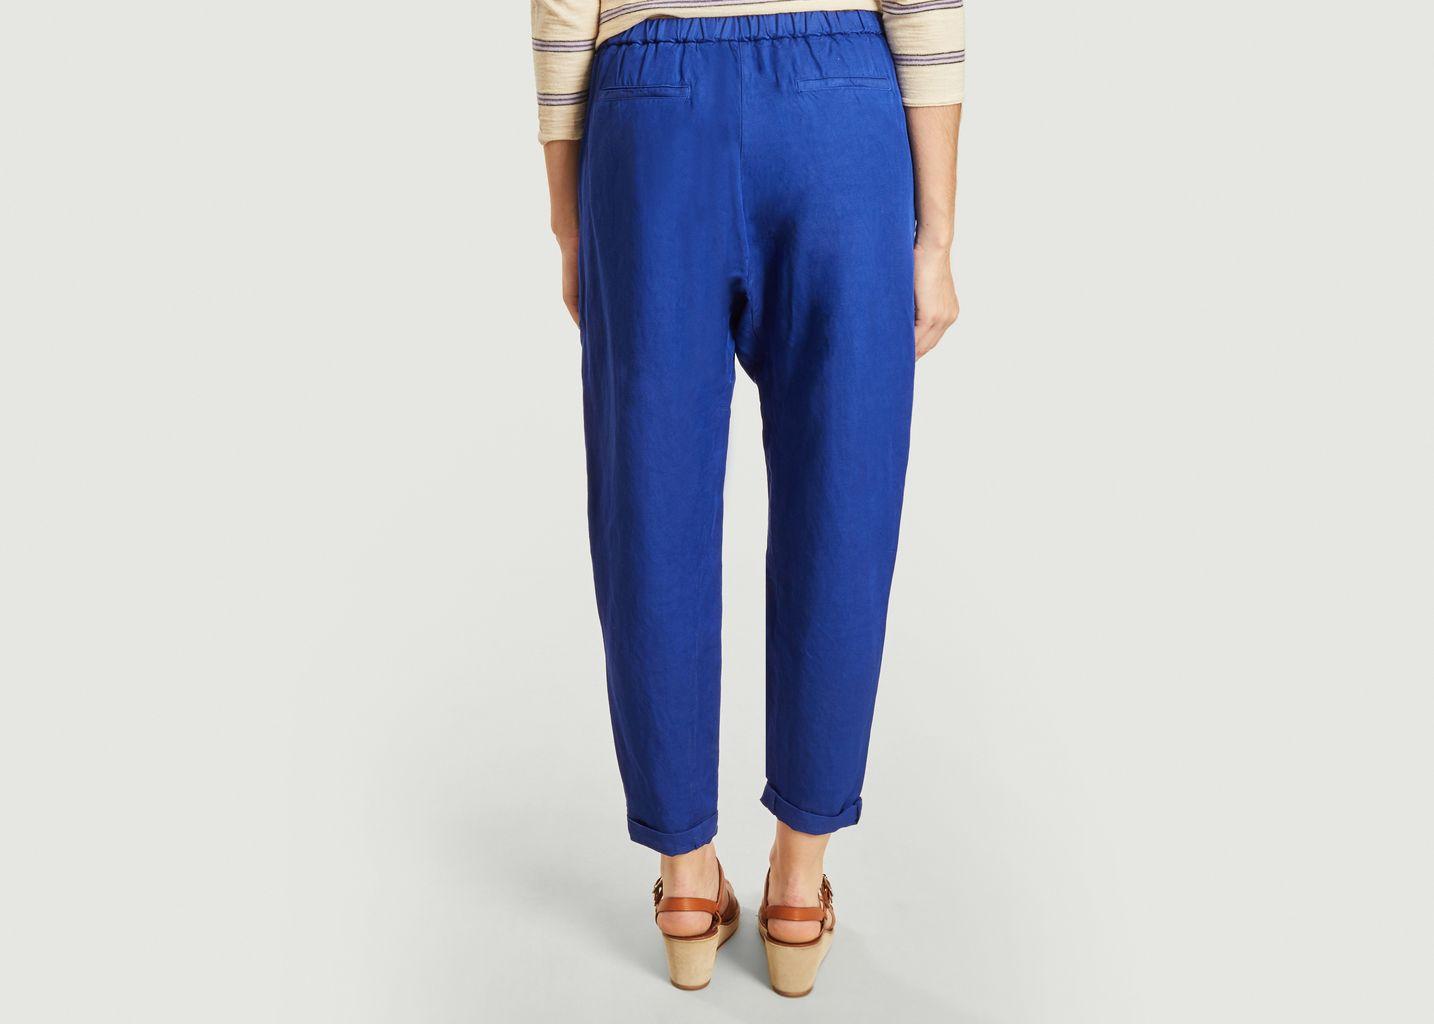 Pantalon Vael - Bellerose